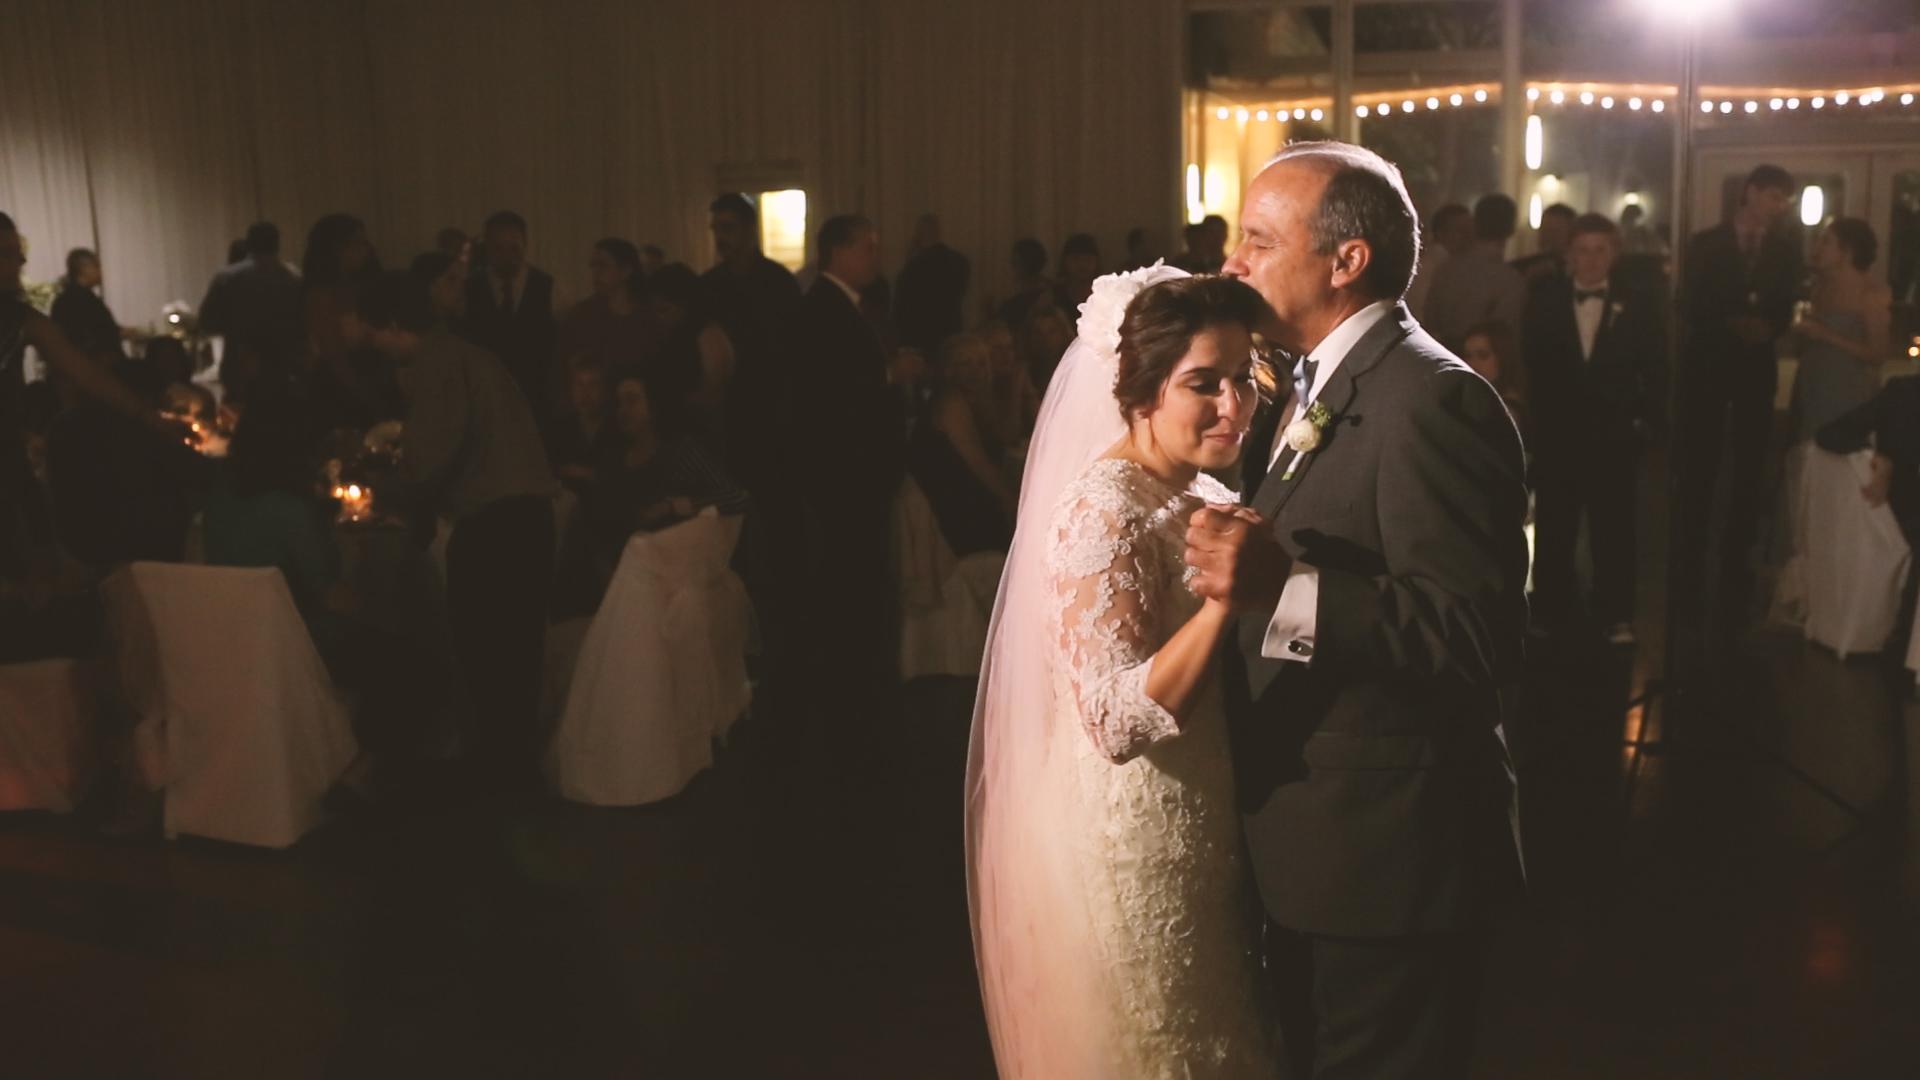 Father Daughter Dance - Bride Film